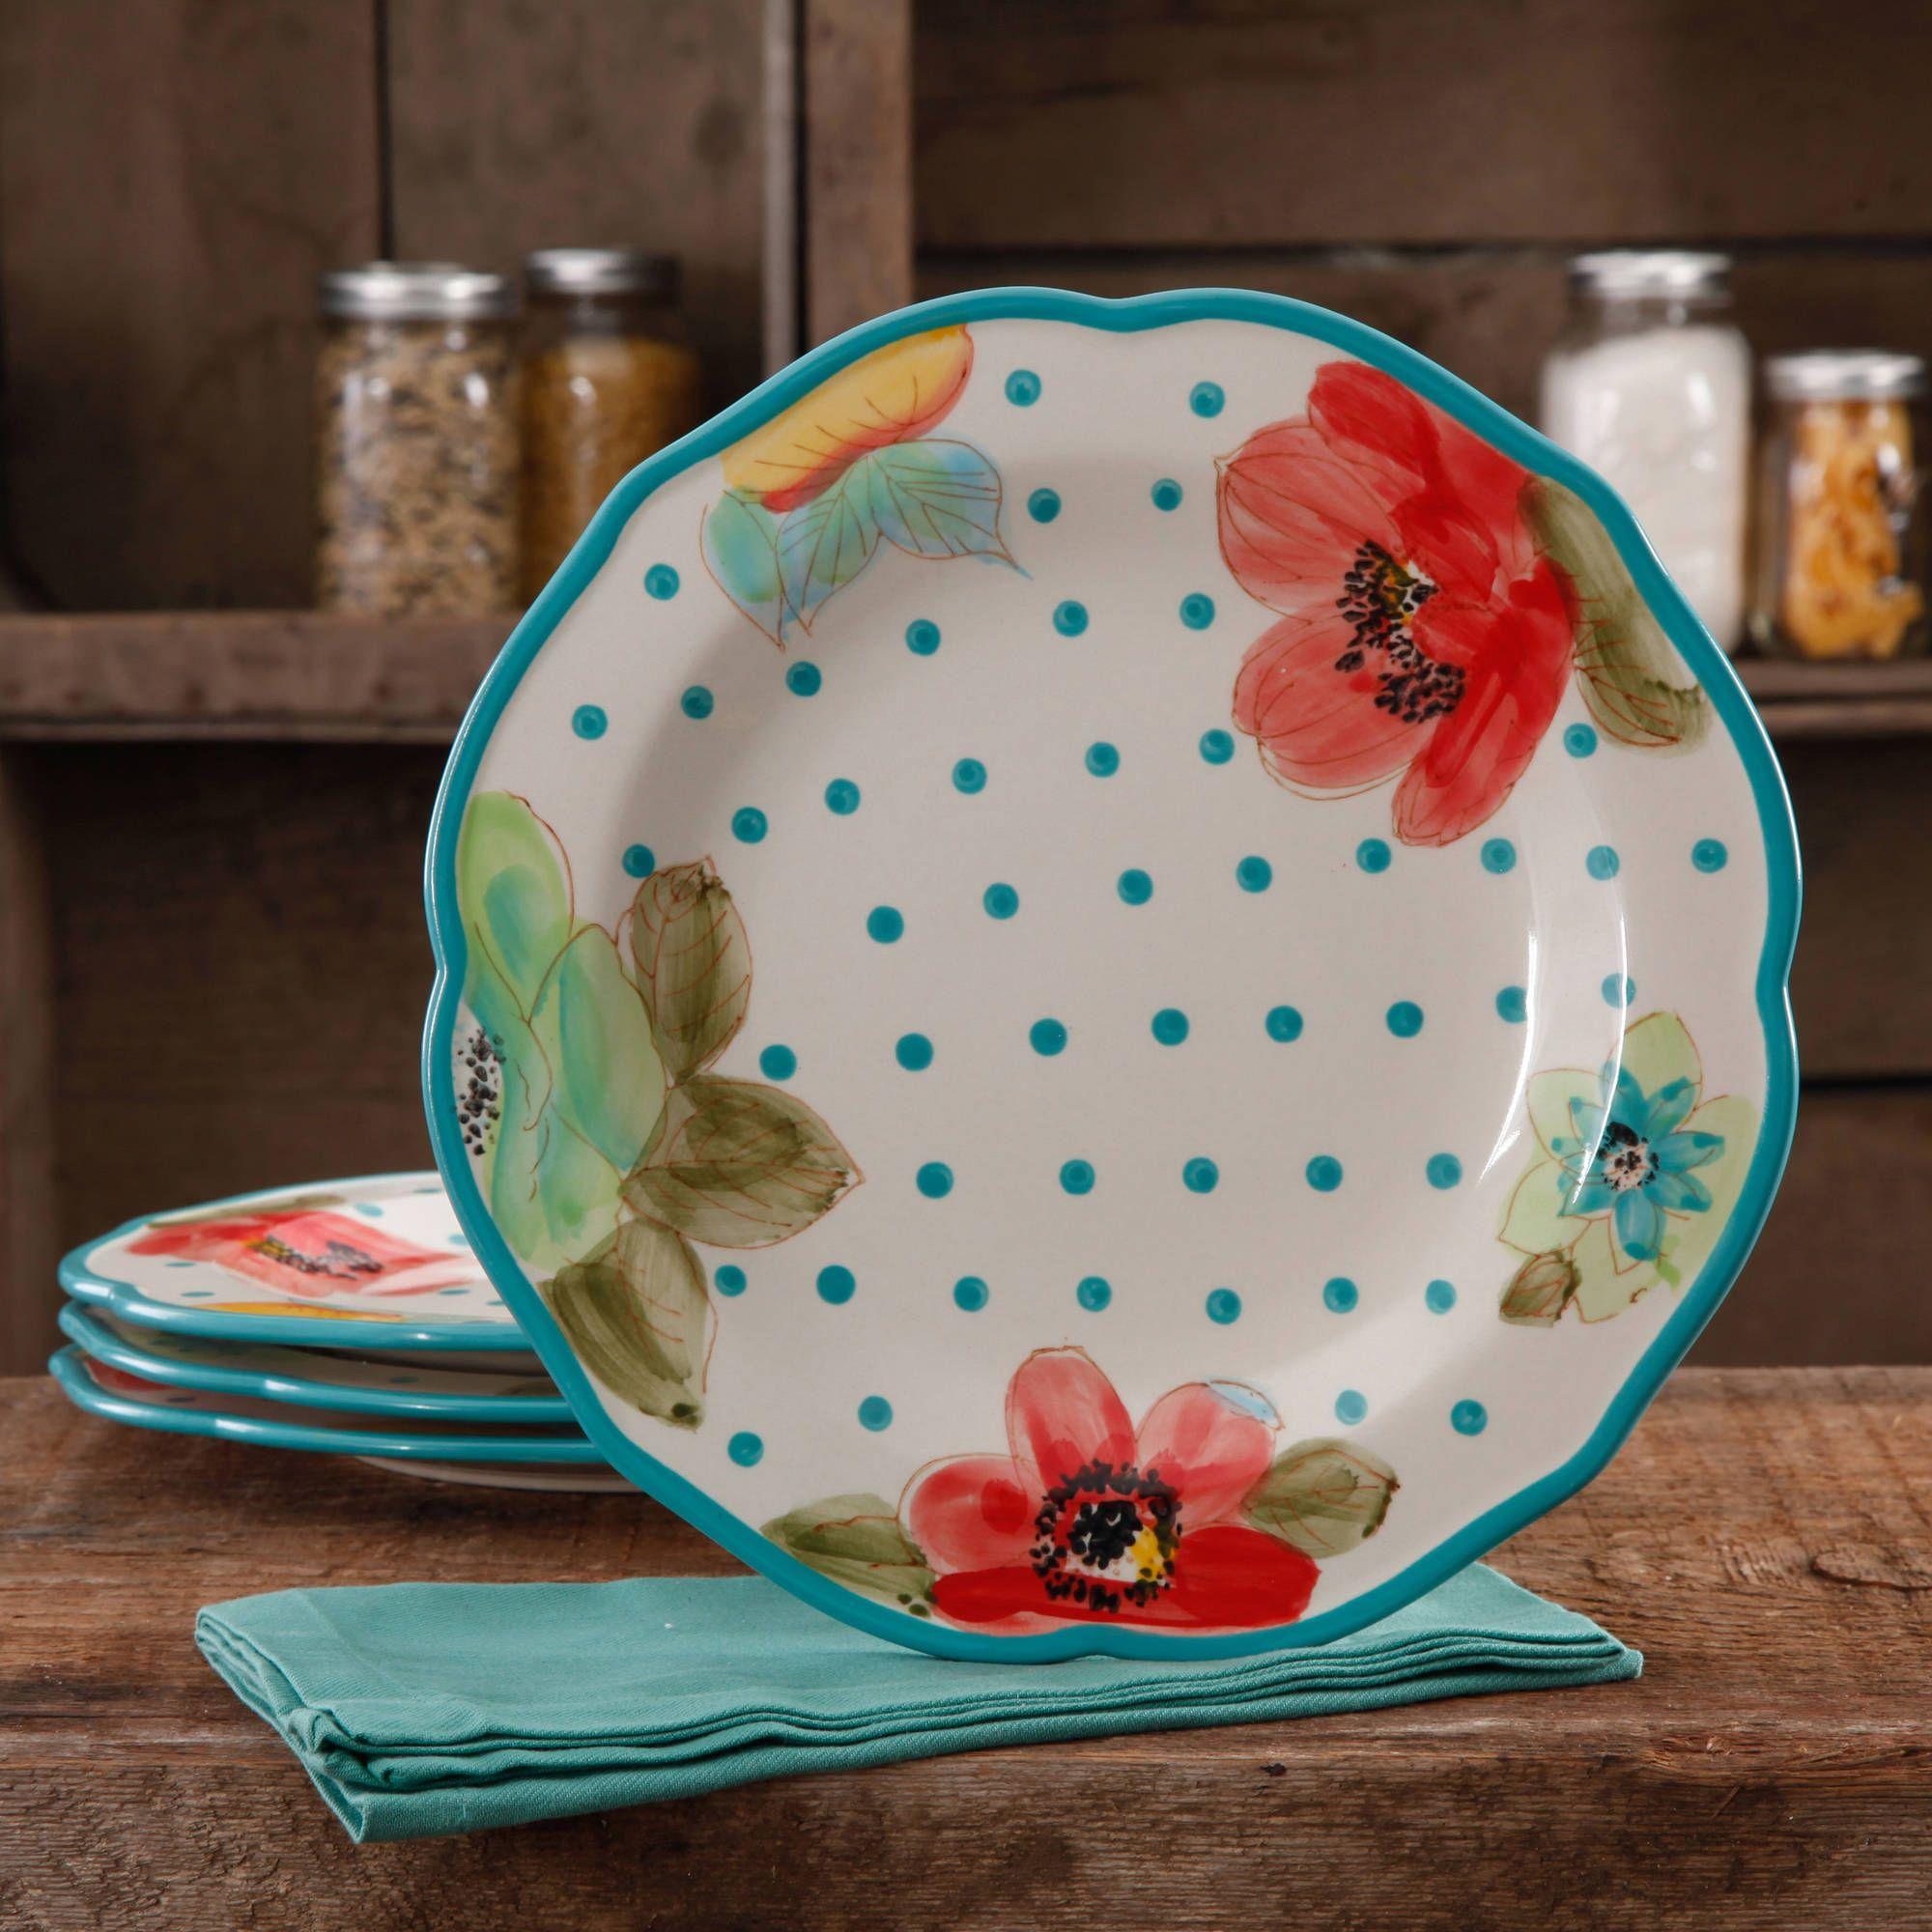 The Pioneer Woman Vintage Bloom 4-Pack Scalloped Dinner Plate Set Multi-Color & The Pioneer Woman Vintage Bloom 4-Pack Scalloped Dinner Plate Set ...